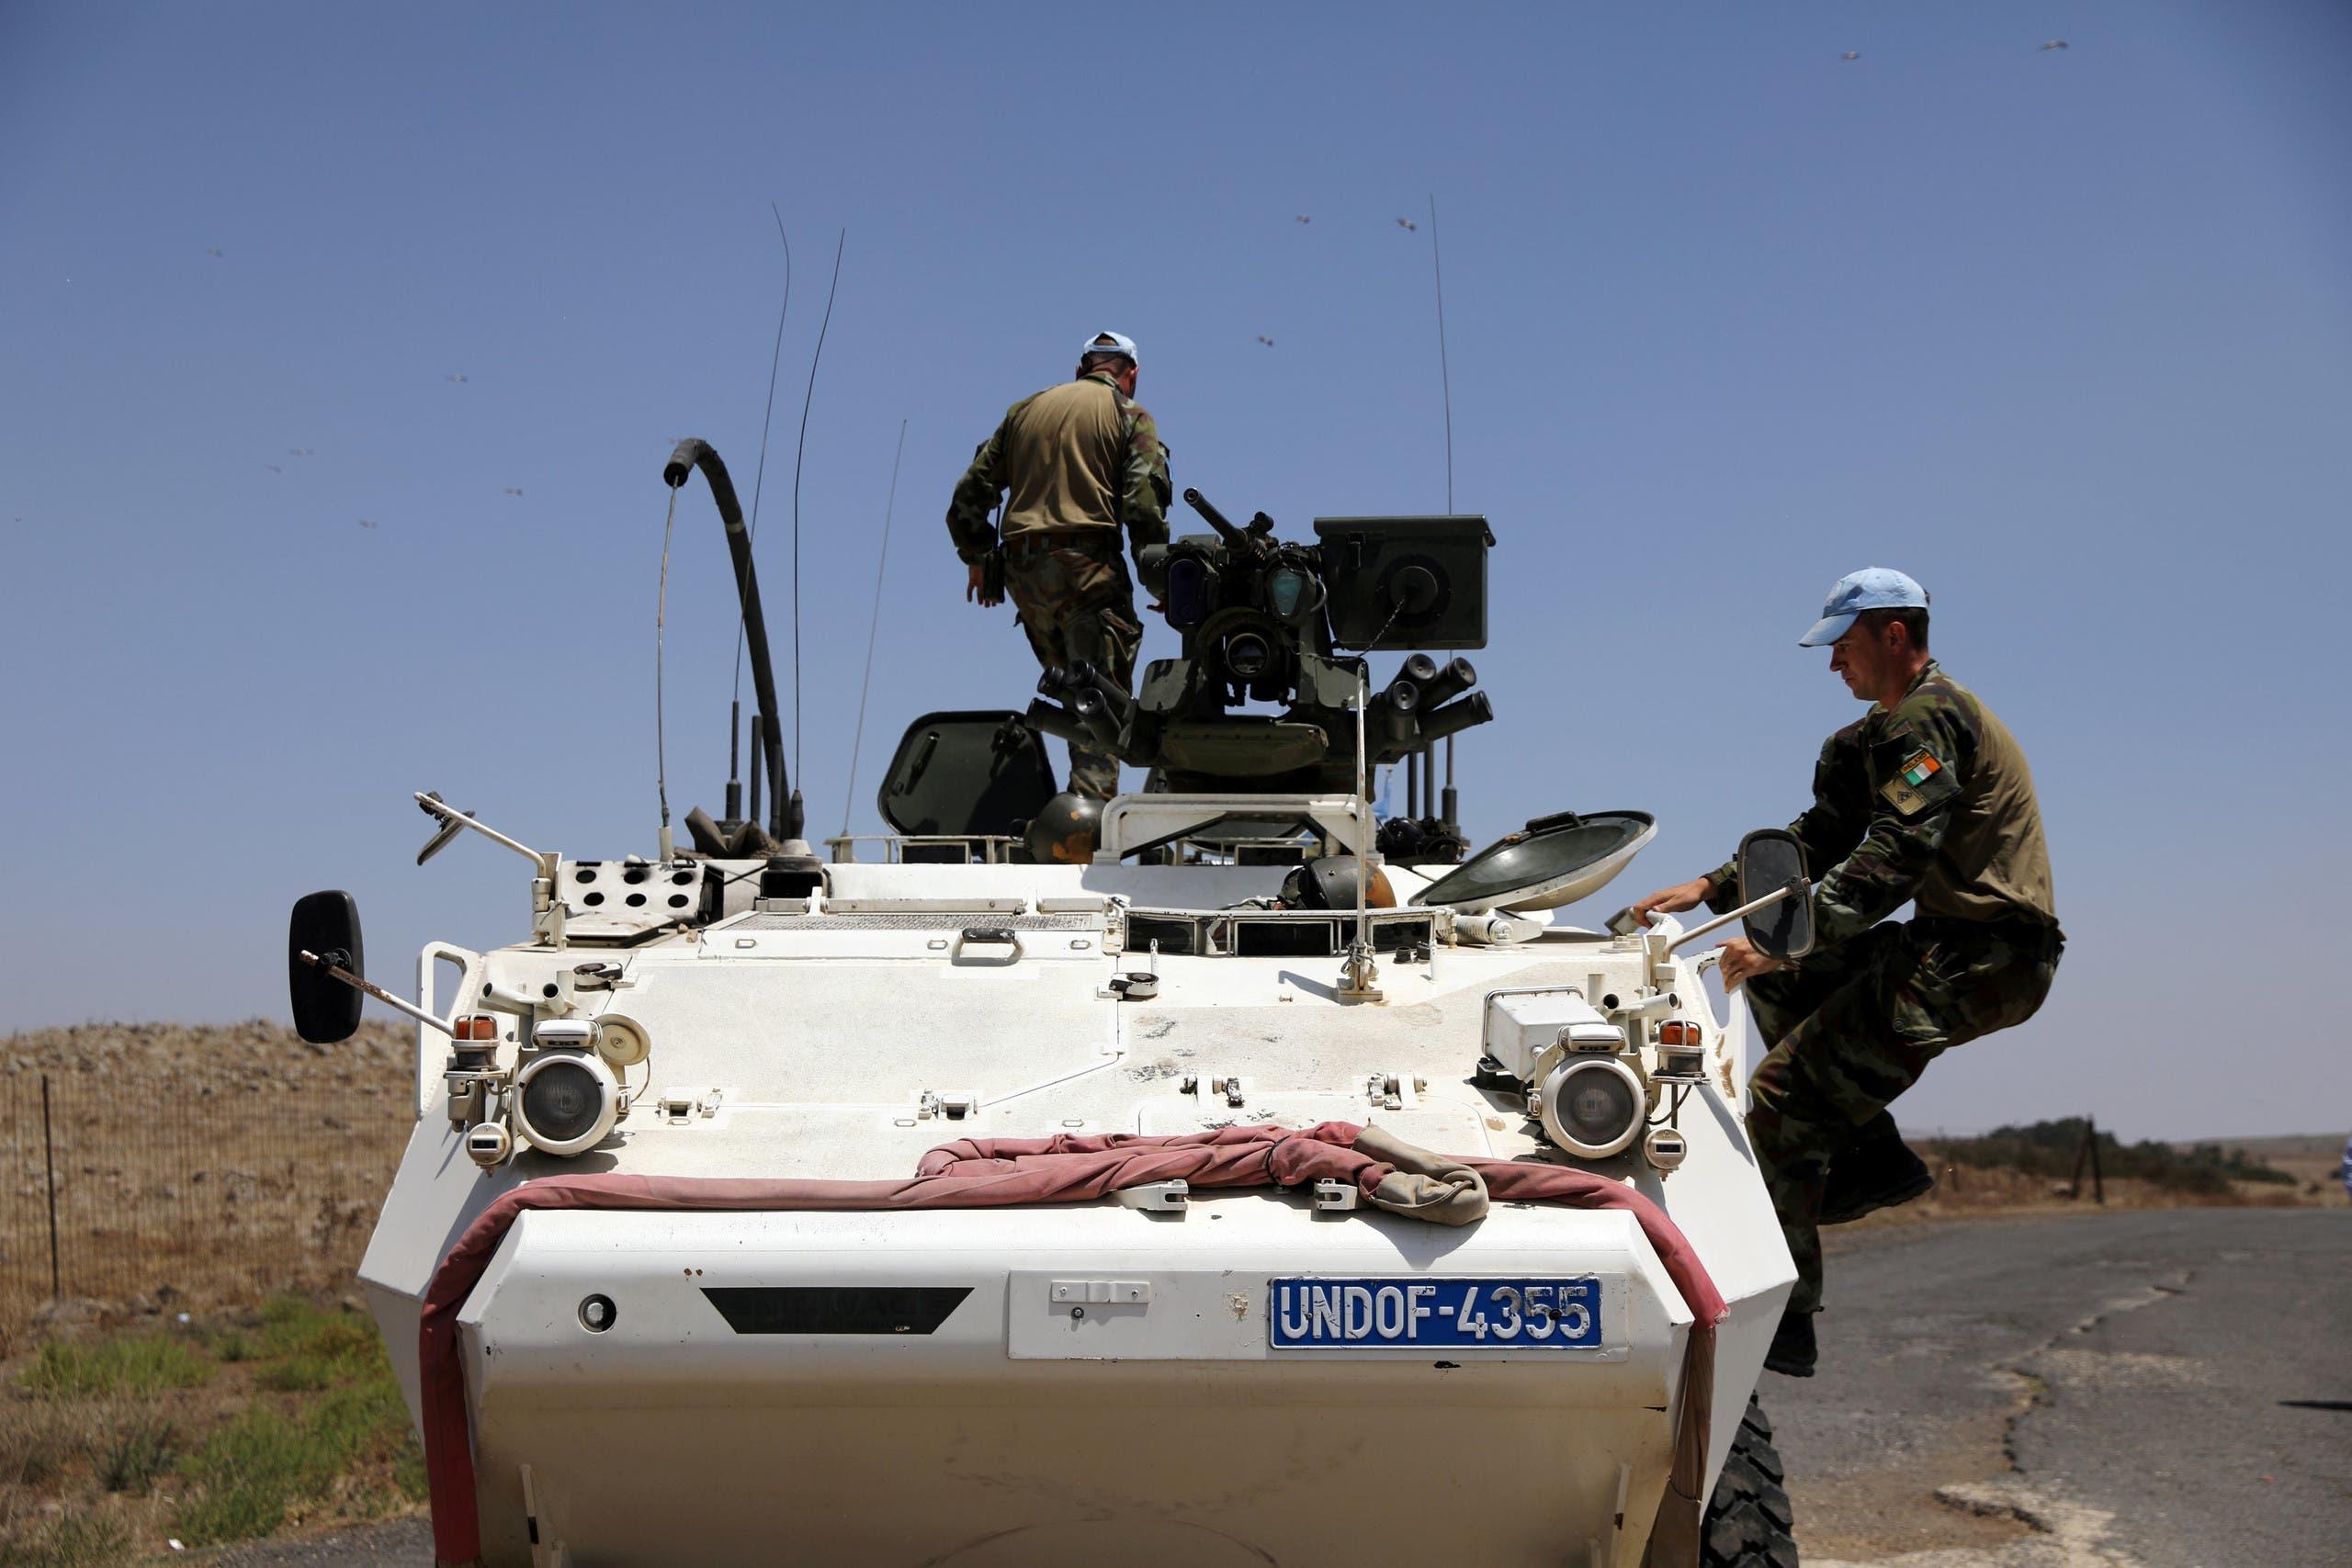 عناصر حفظ السلام بين إسرائيل وسوريا